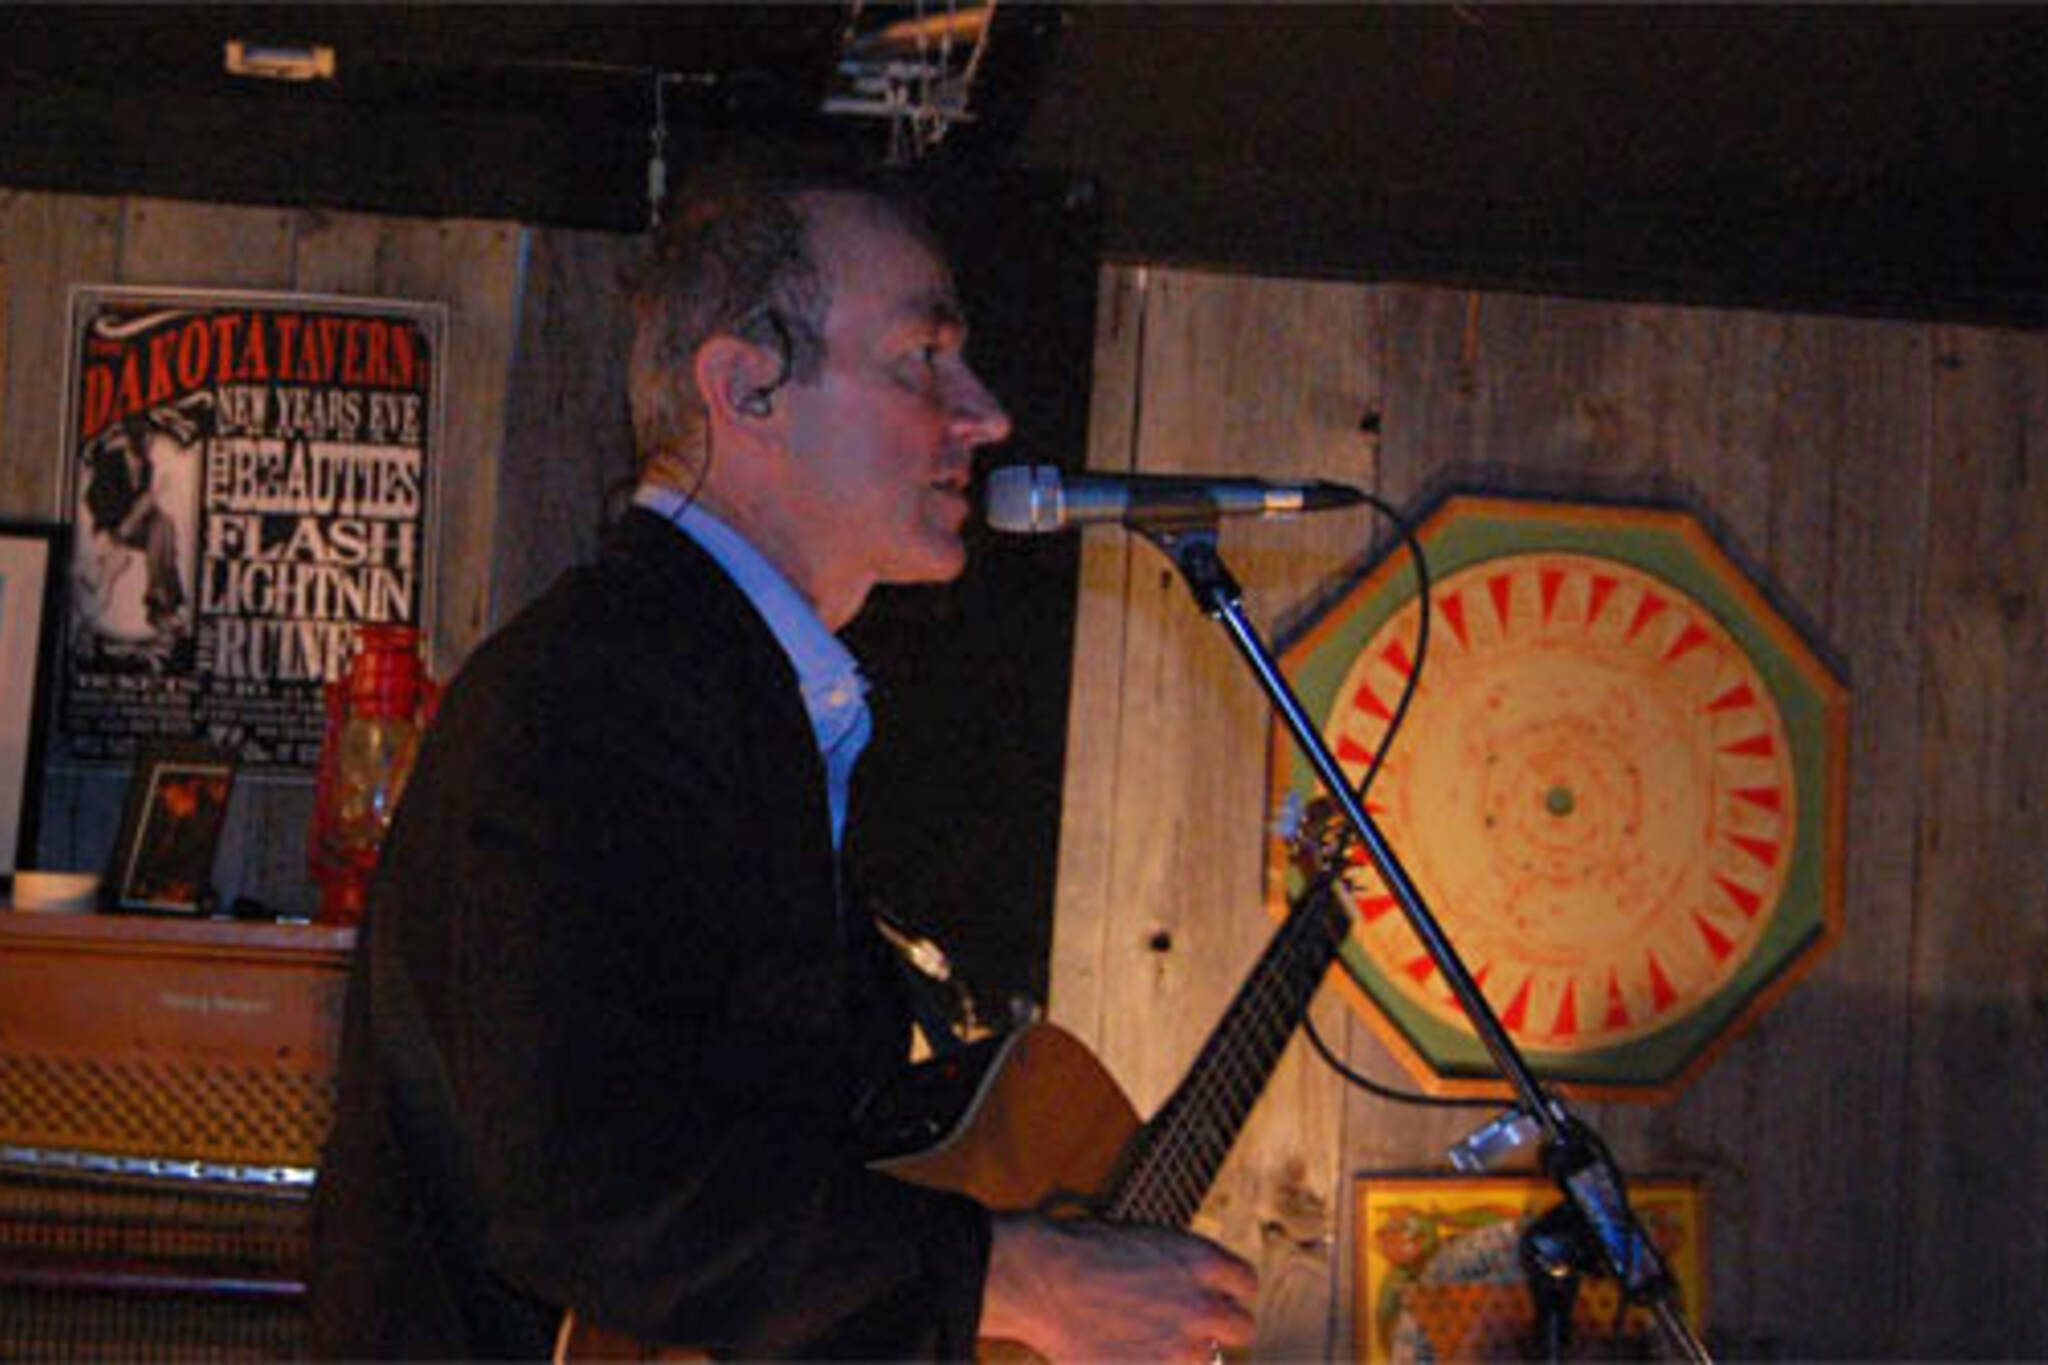 Punk rock elder statesman Hugh Cornwell